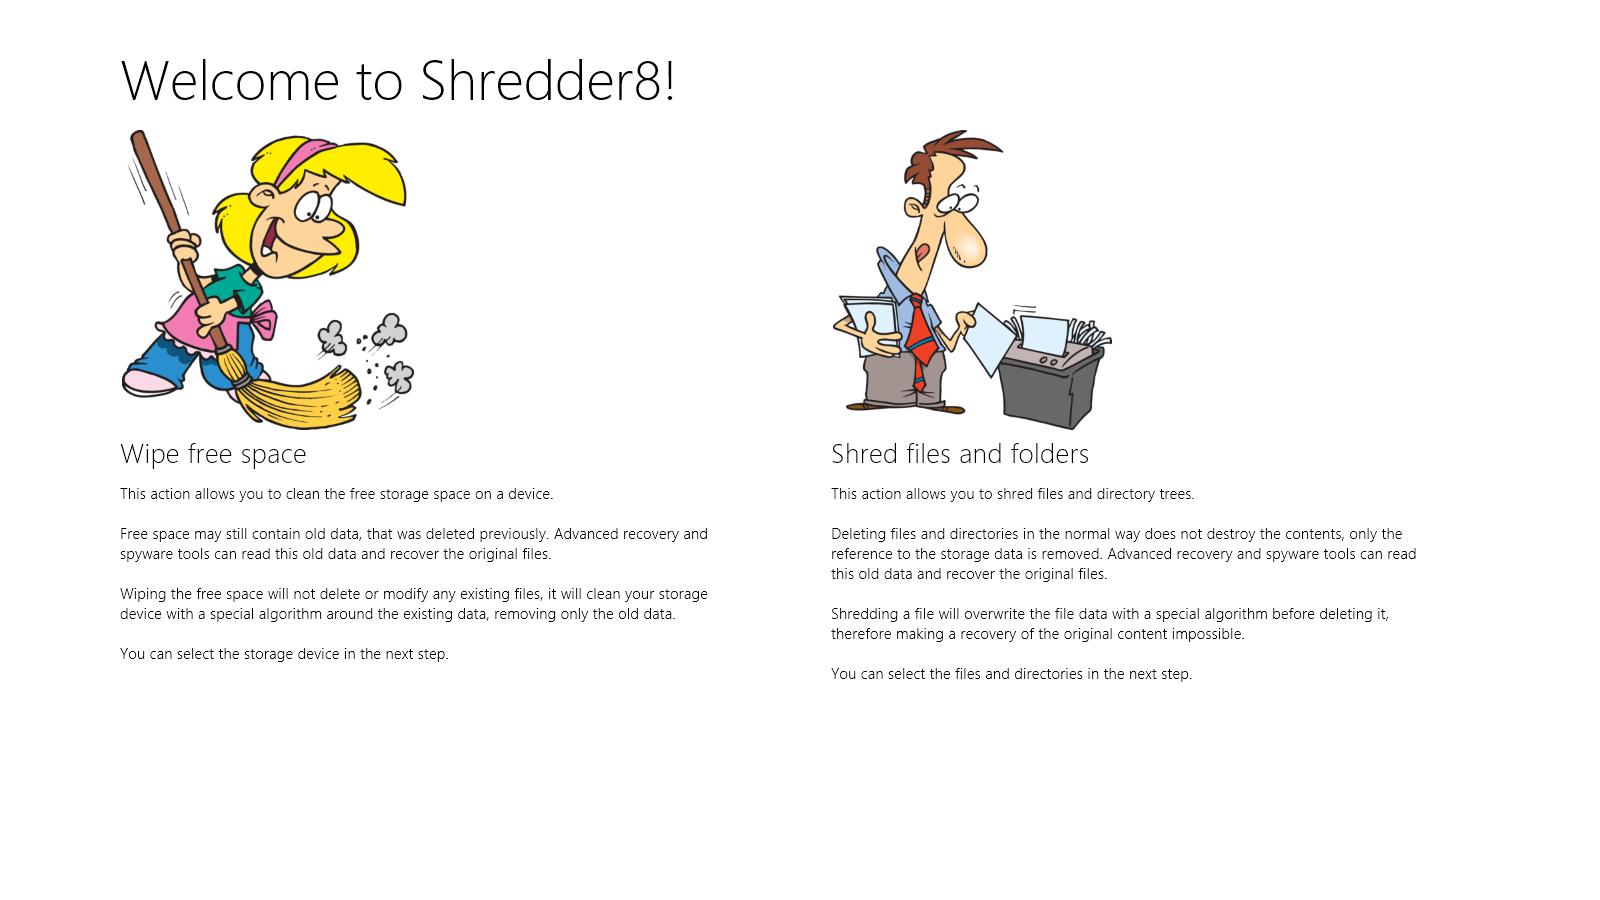 Shredder8 — программа для надежного, безвозвратного удаления файлов